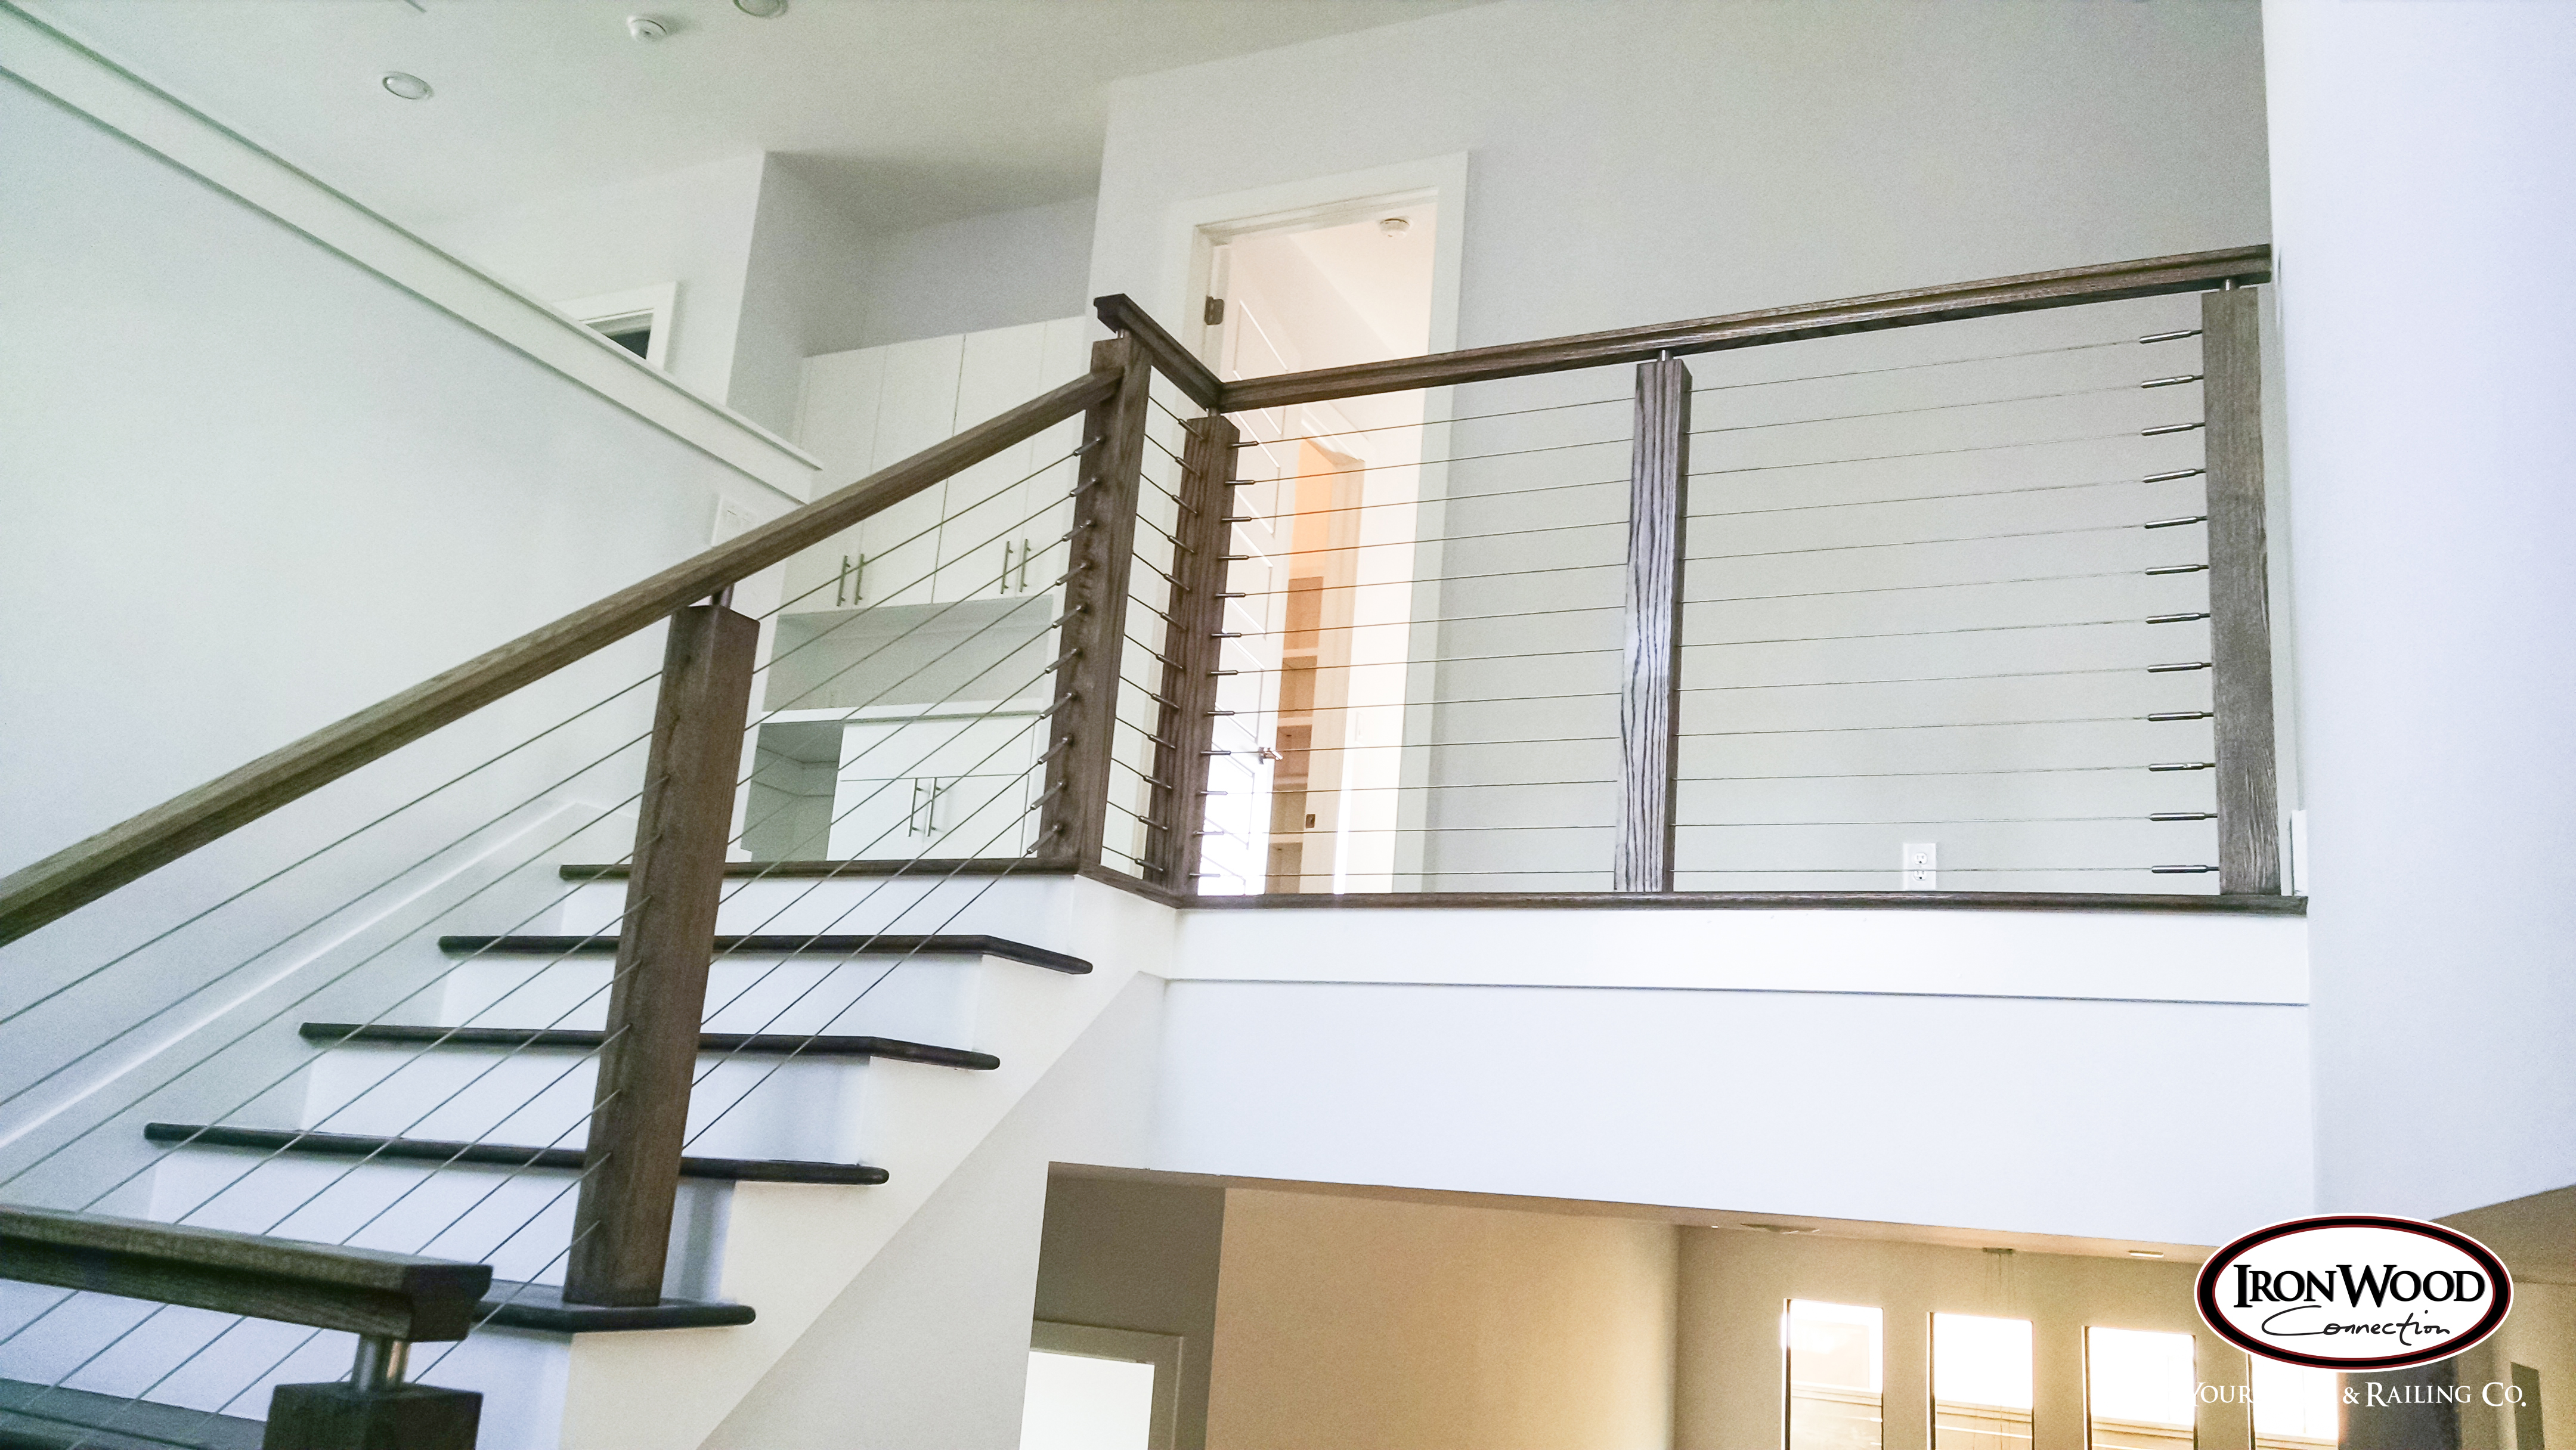 Glass U0026 Cable Staircase U2013 Ironwood Connection   Stair U0026 Railing Company